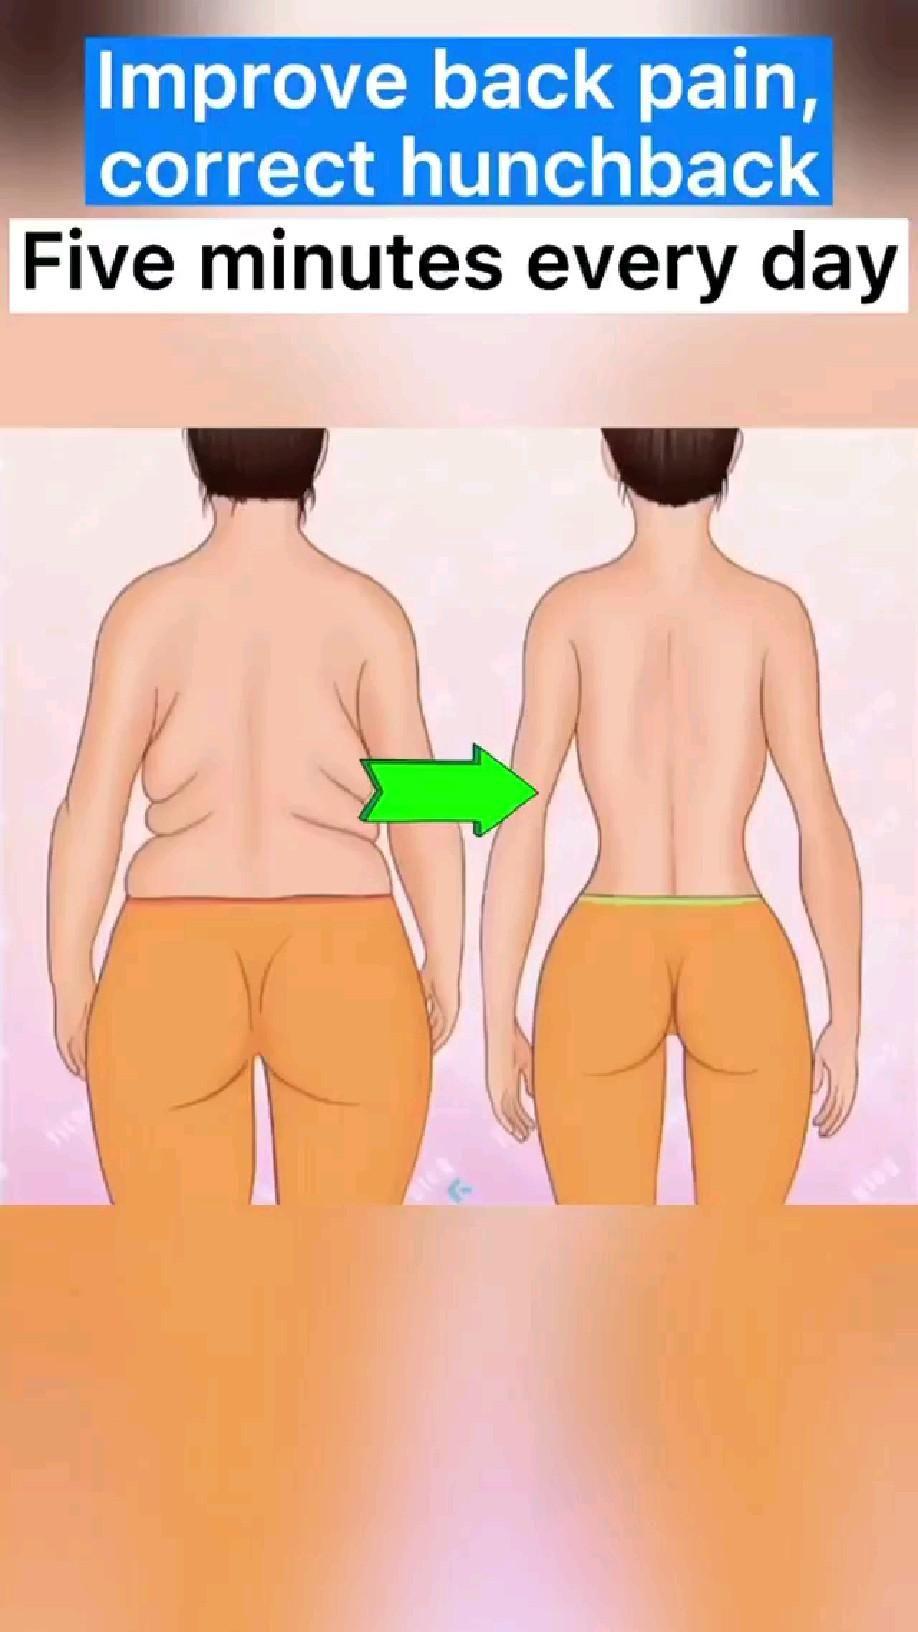 improve back pain, correct hack